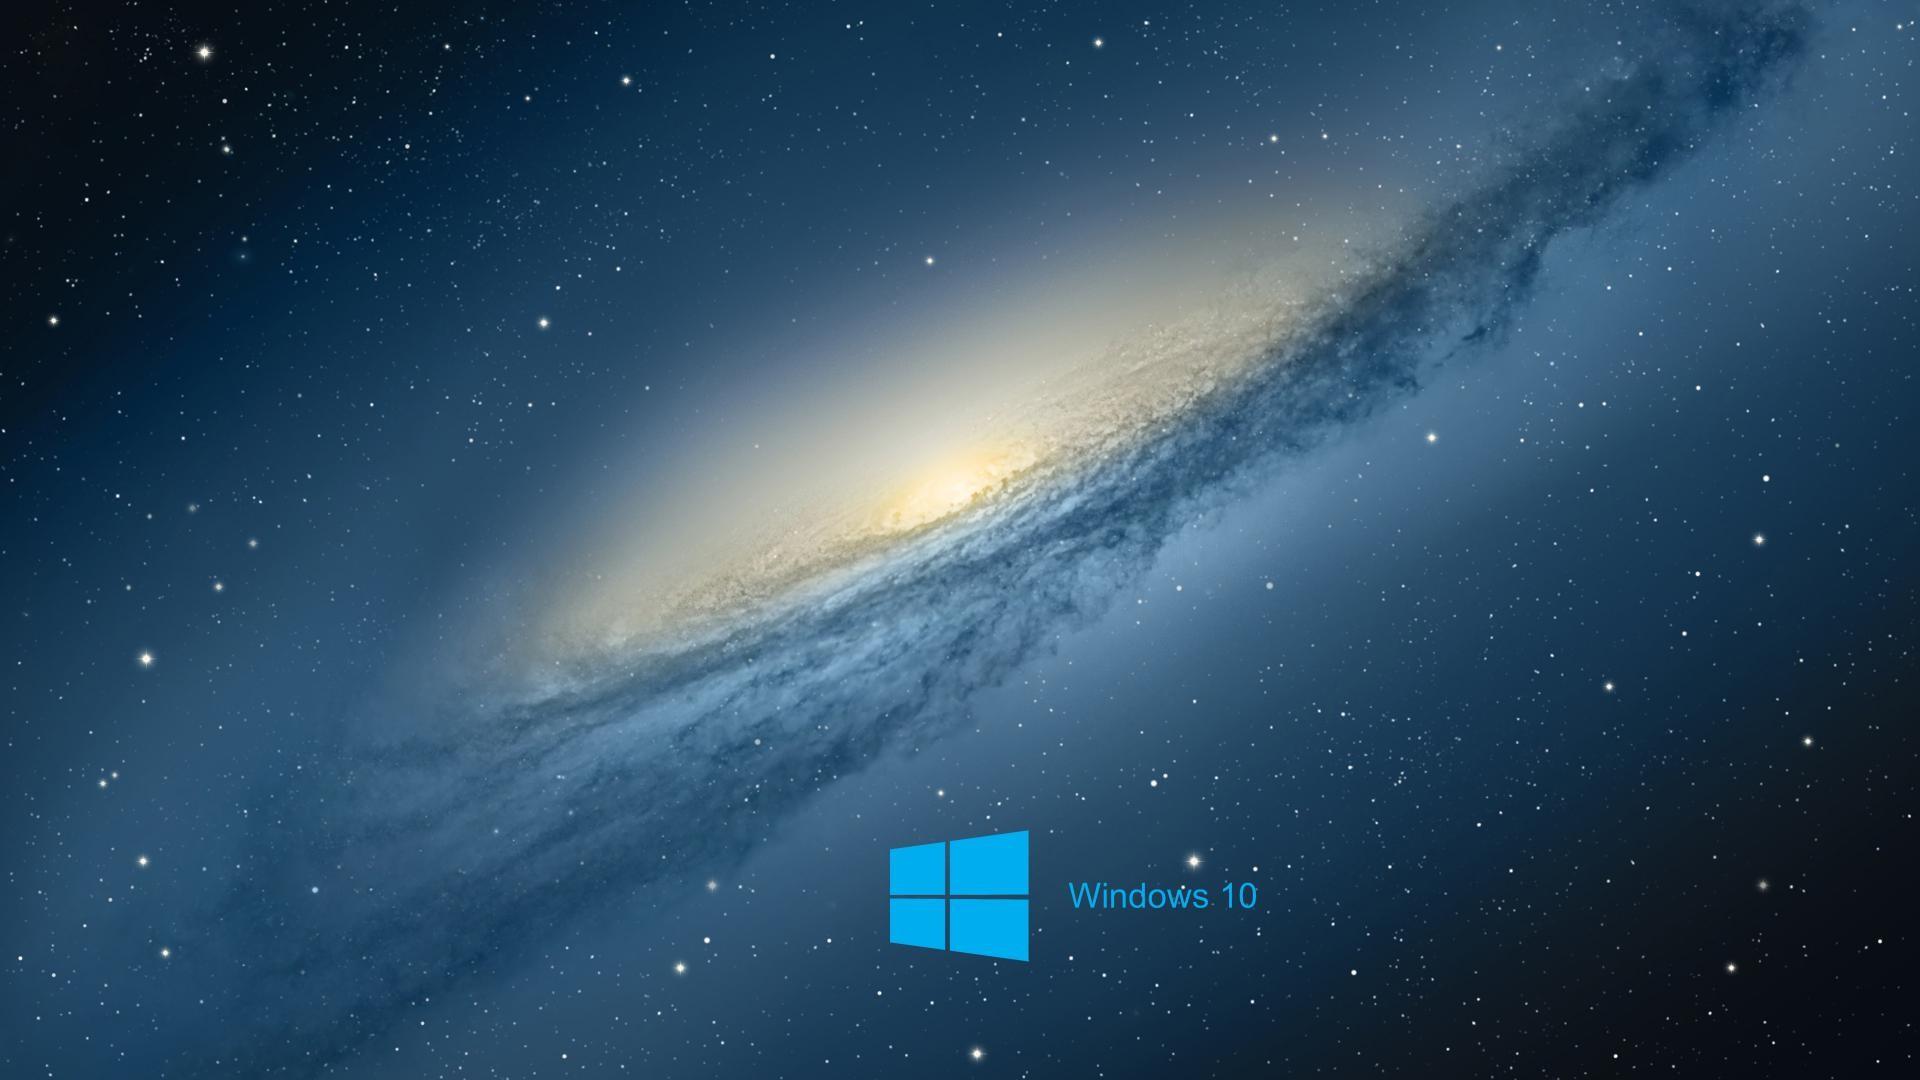 Sfondi windows 10 4k 62 immagini for Sfondi pc 4k